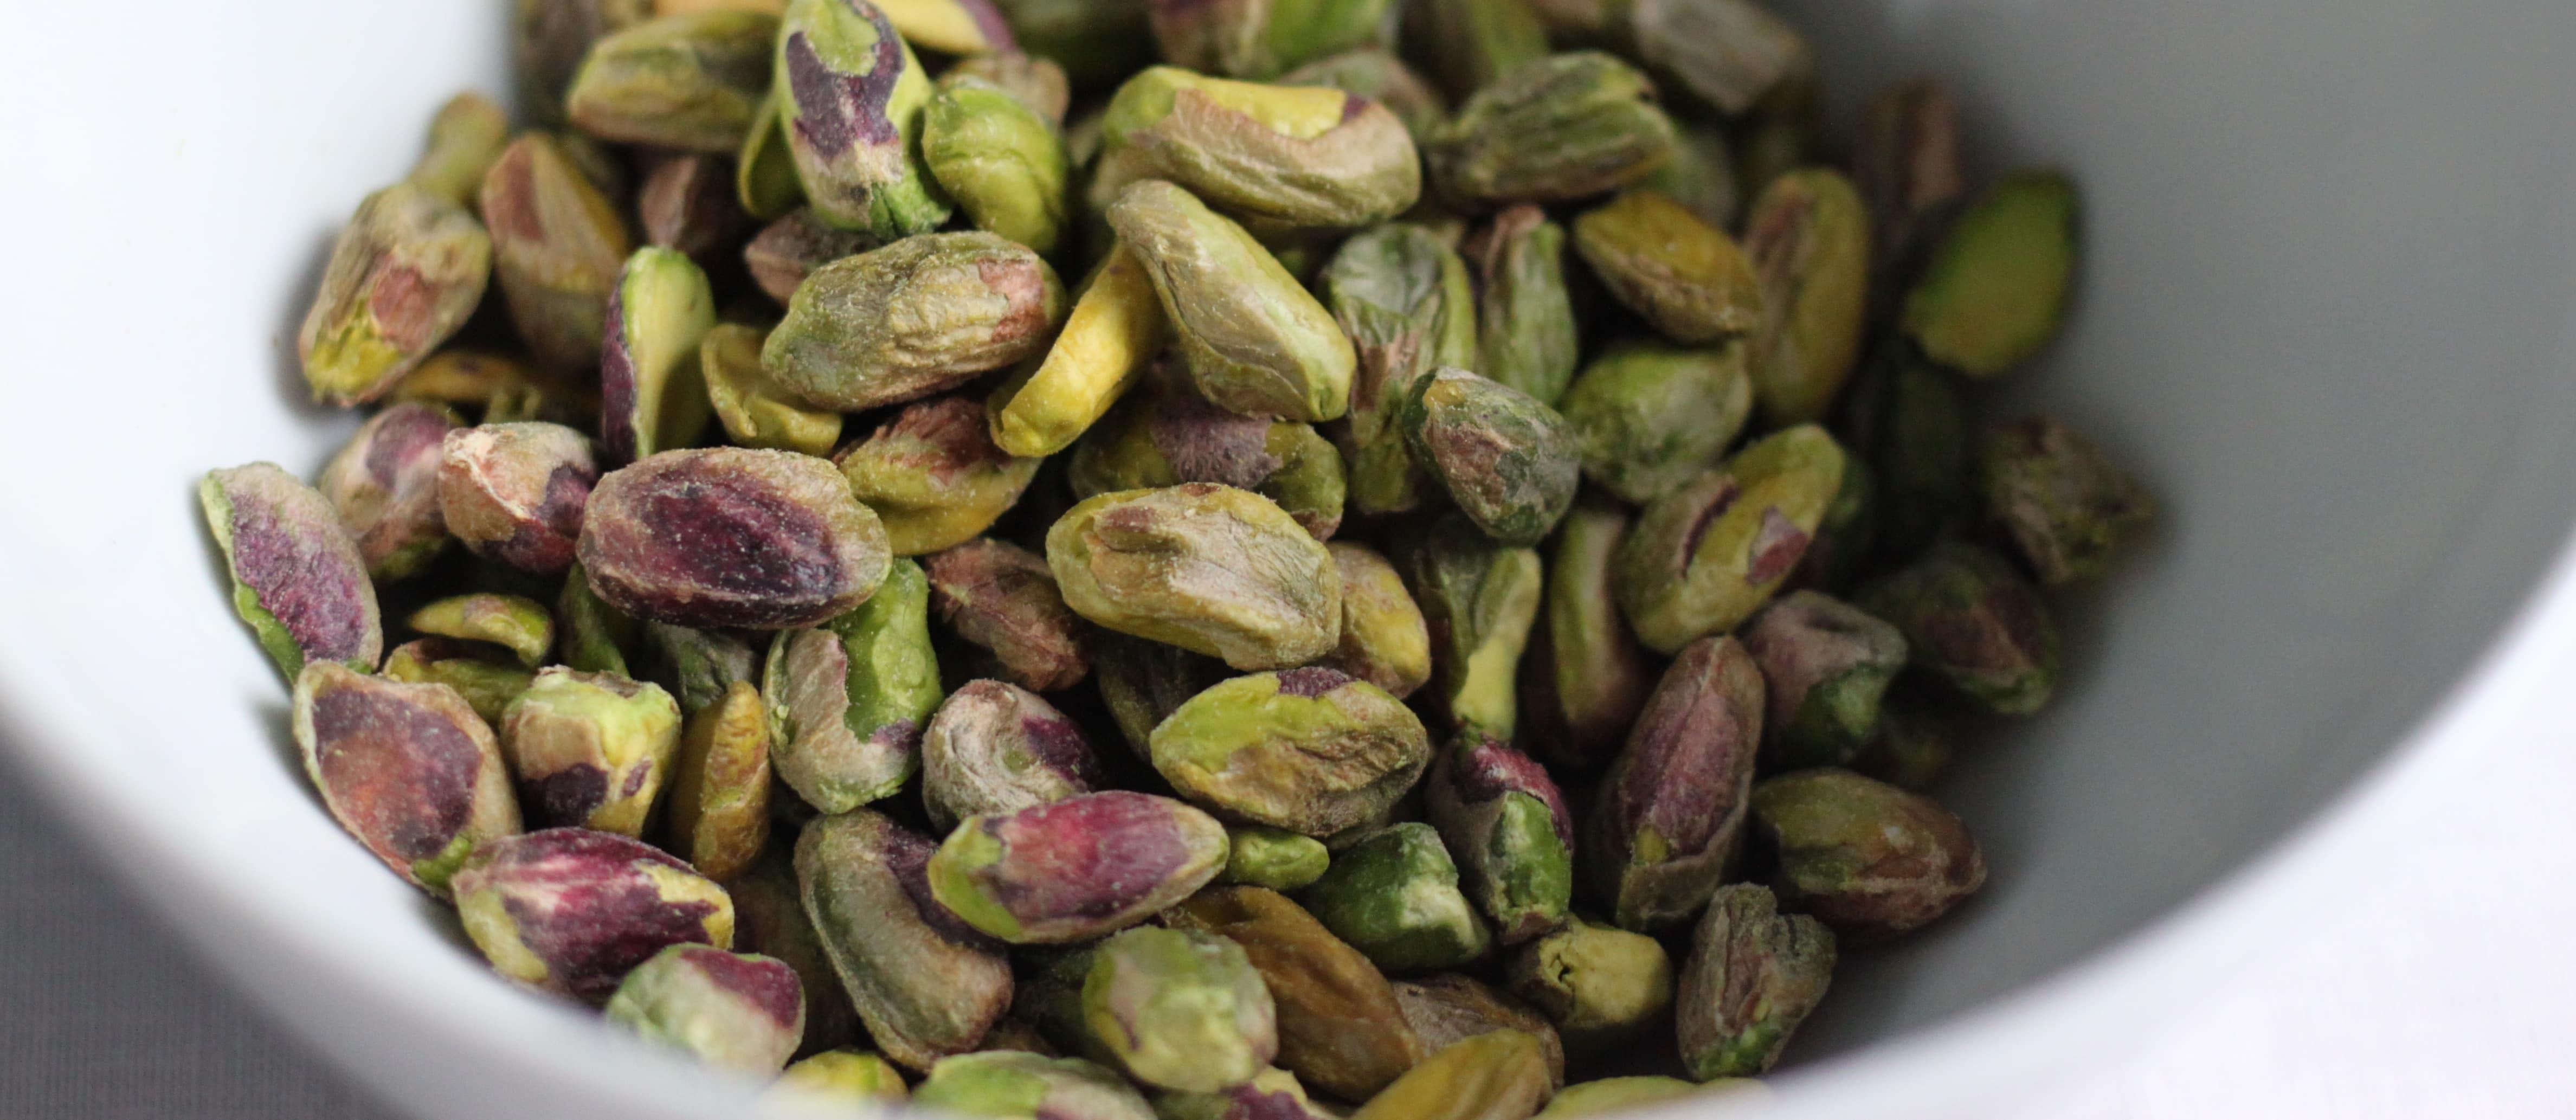 Could Pistachio Nuts Help Stop Erectile Dysfunction?